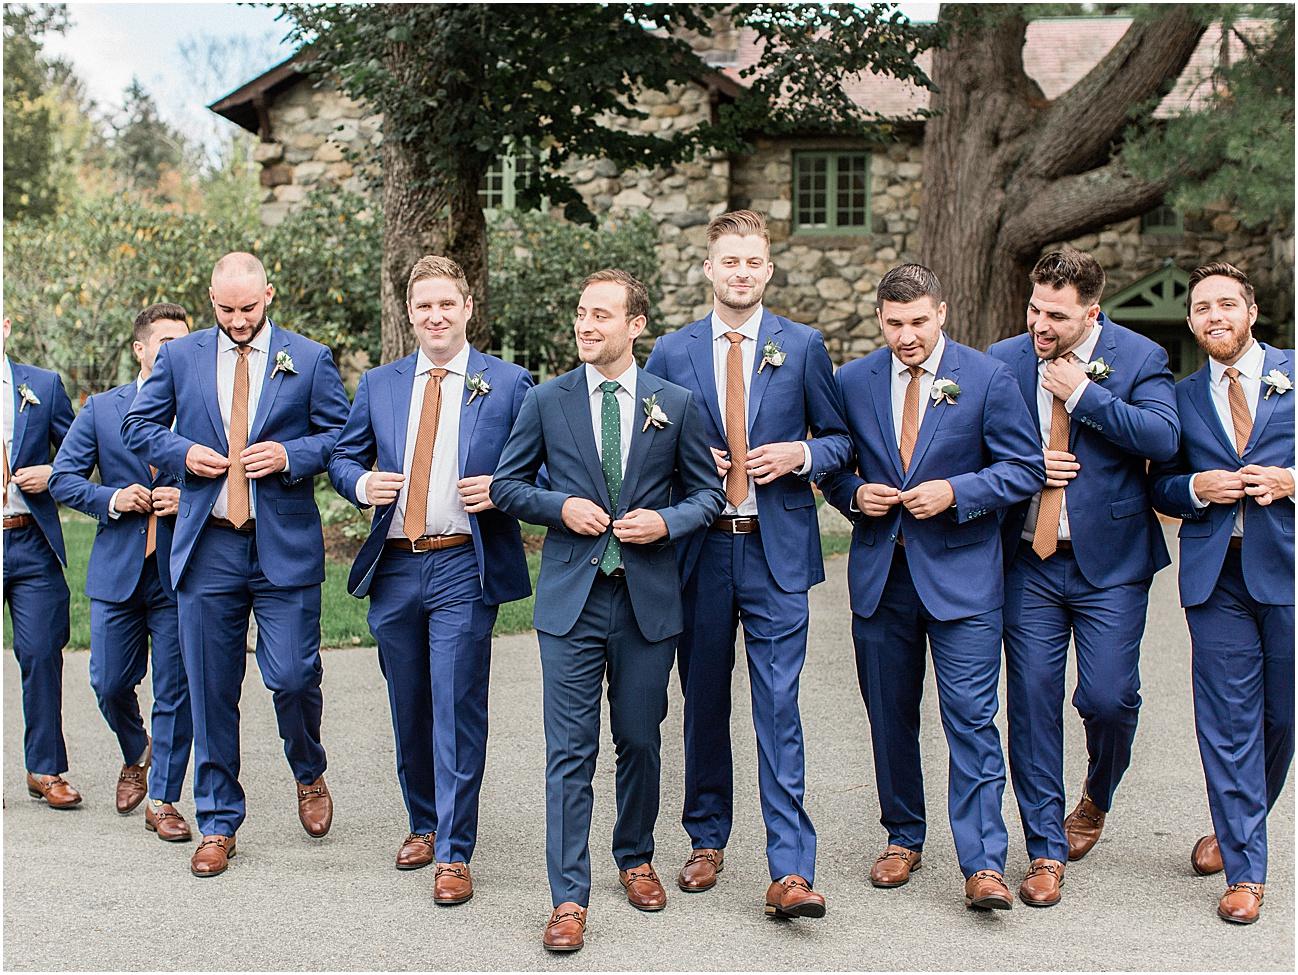 jenna_mike_willowdale_estate_topsfield_neutral_whites_greens_fall_cape_cod_boston_wedding_photographer_meredith_jane_photography_photo_1440.jpg